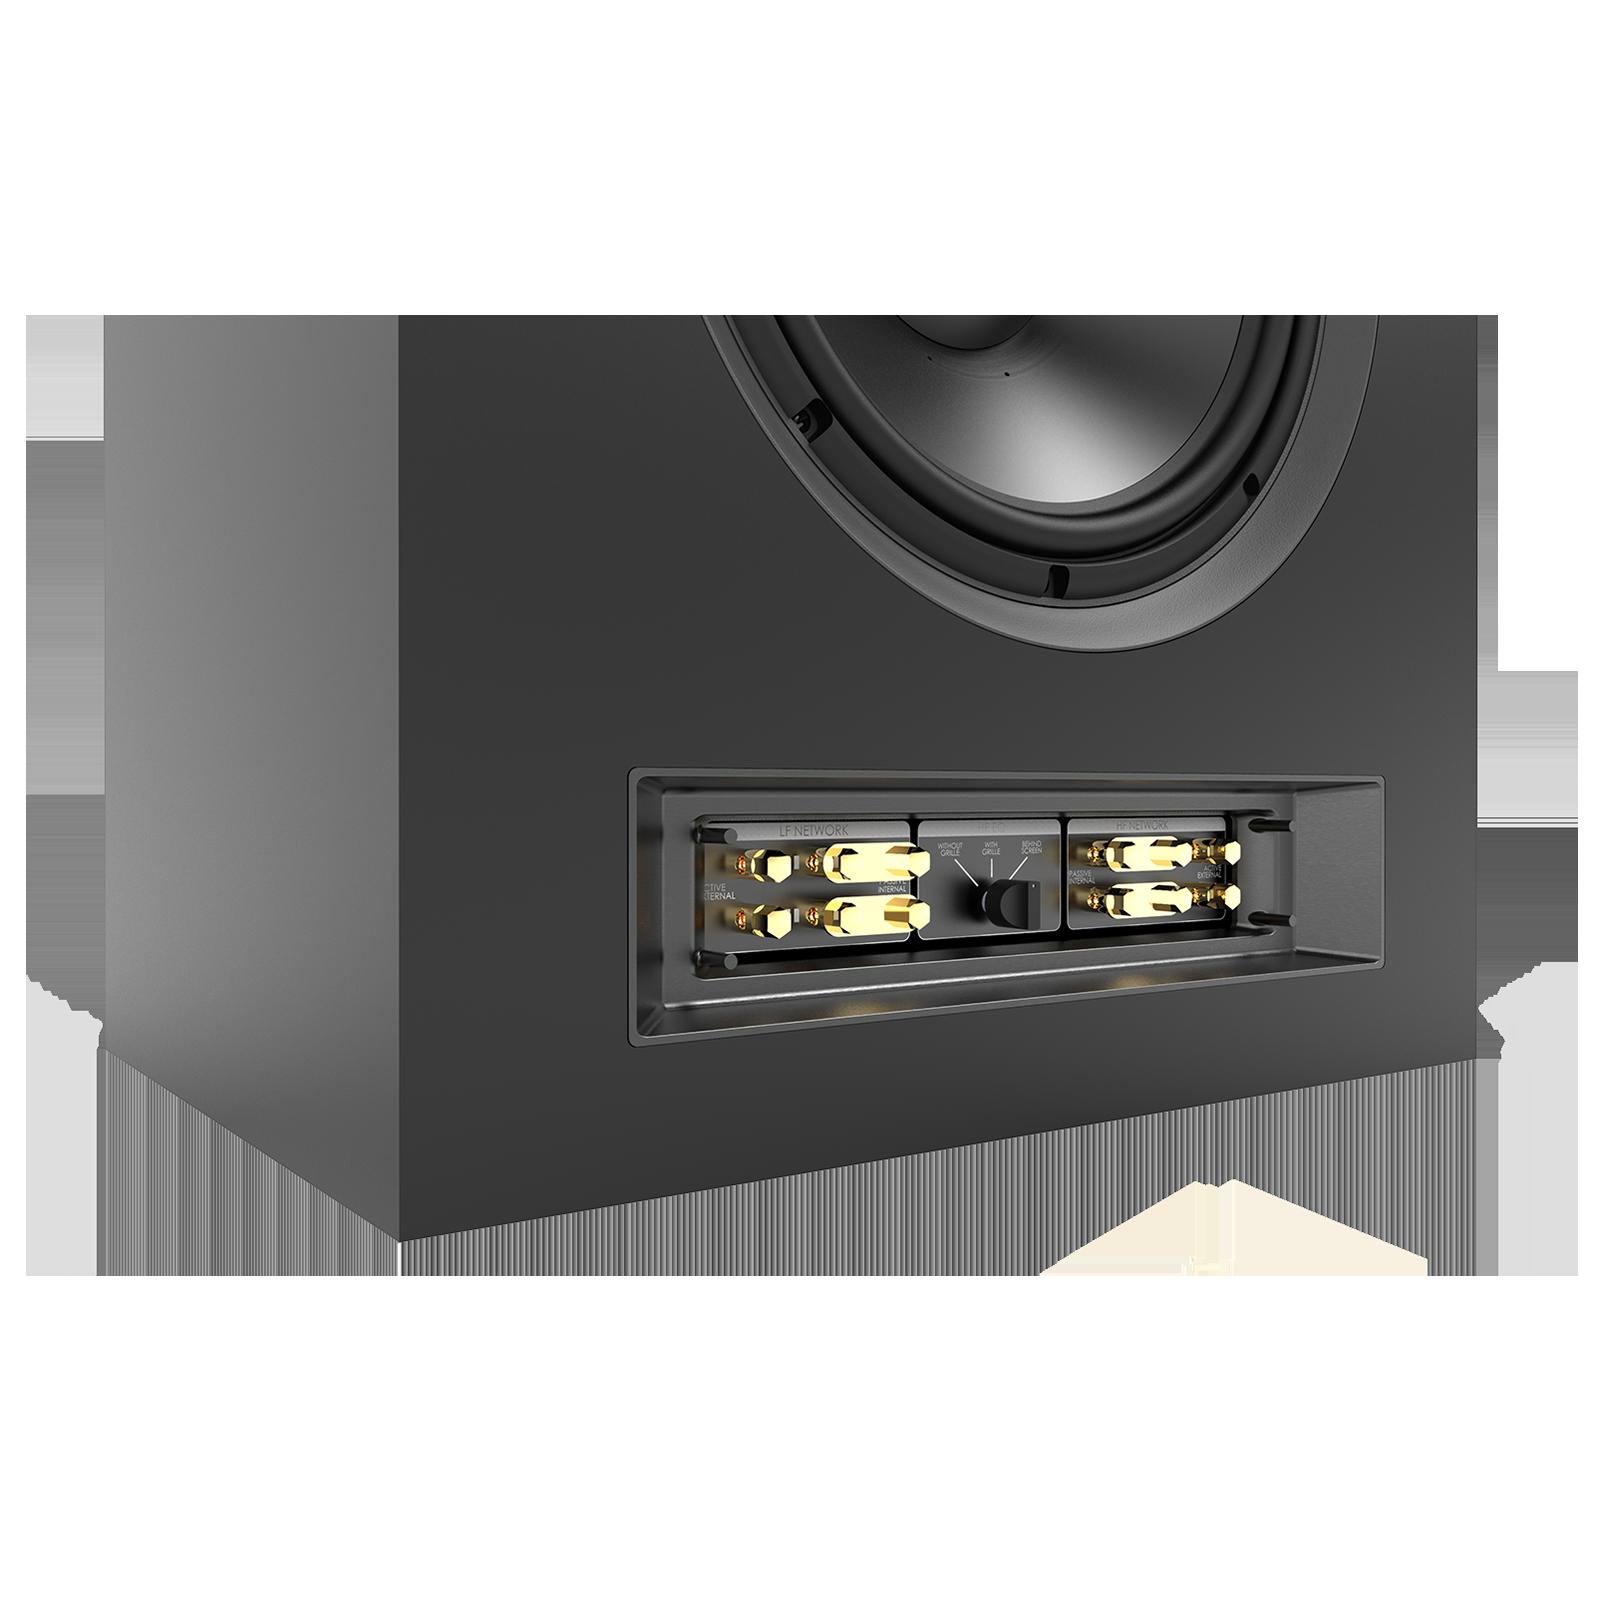 SCL-1 - Black - 2-Way Dual 12-inch (300mm) Custom LCR Loudspeaker - Detailshot 3